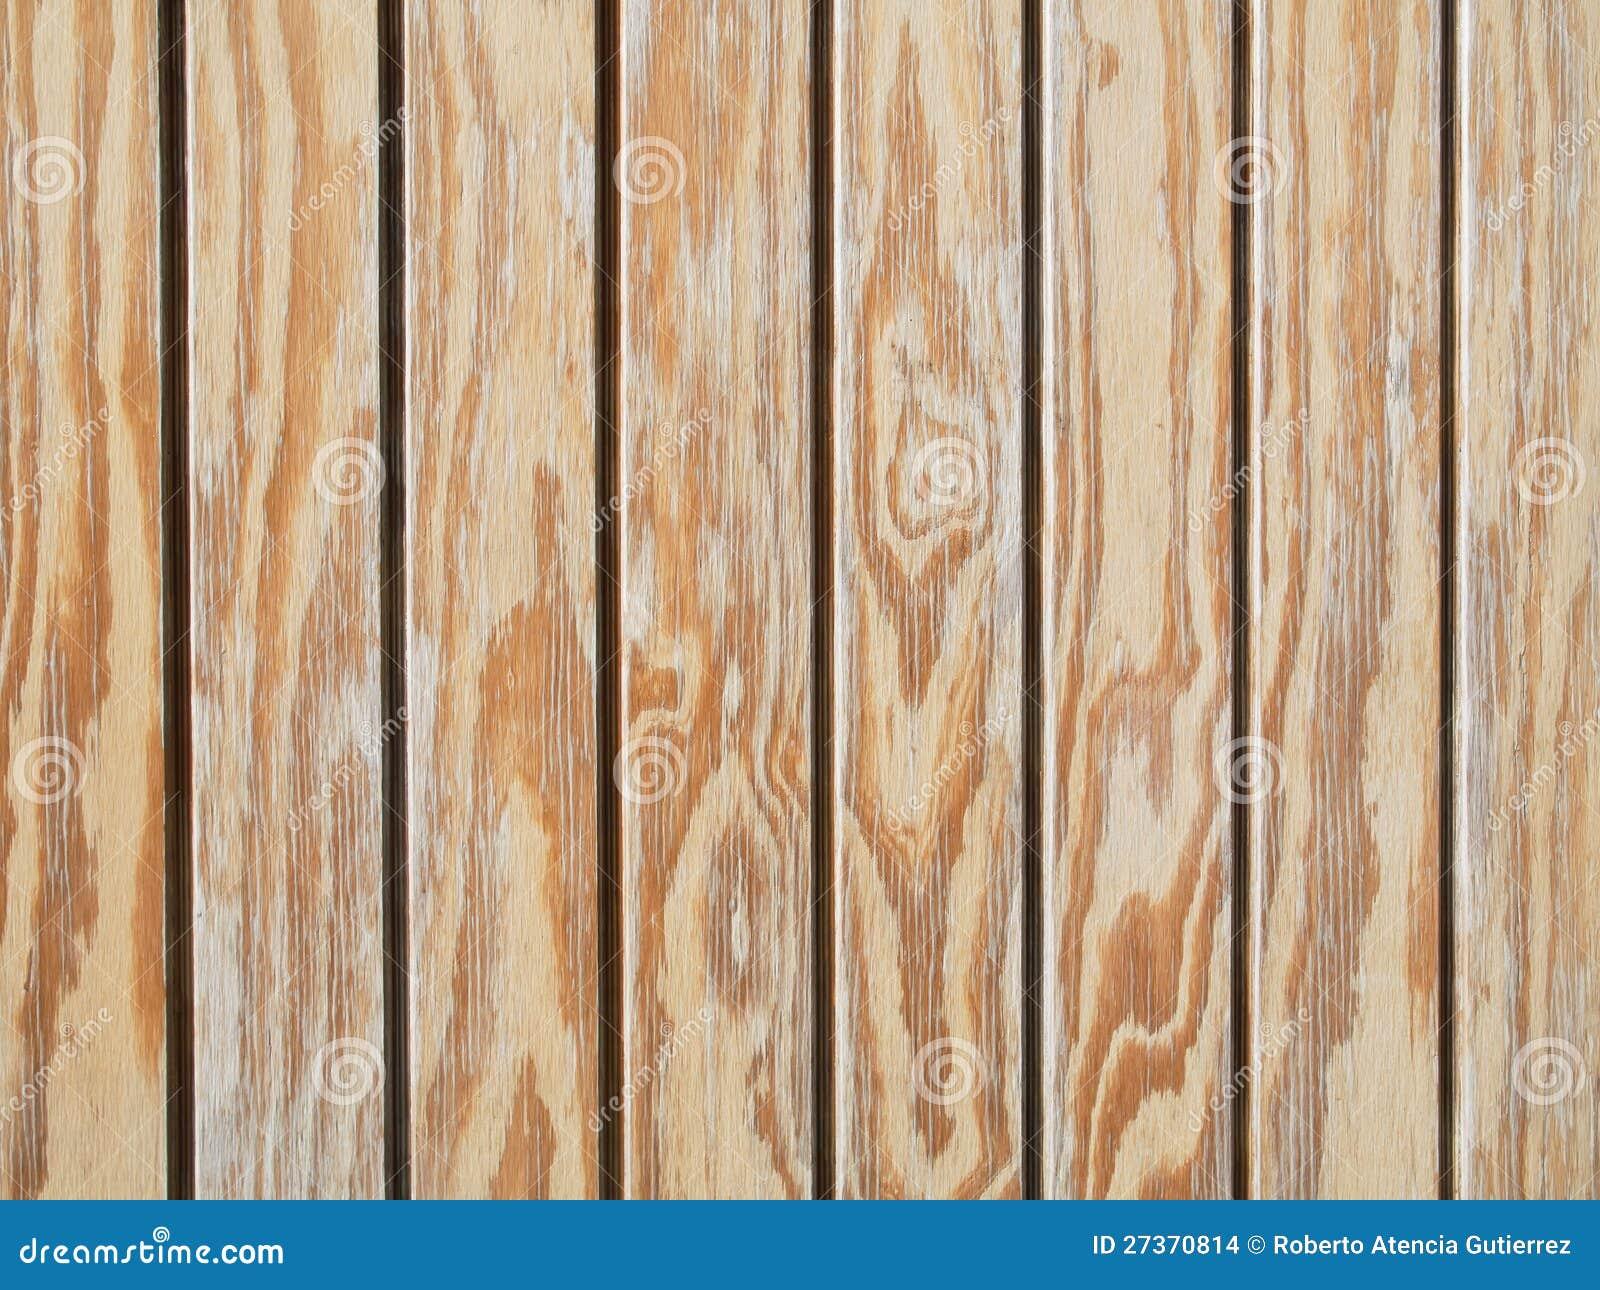 Textura de listones de madera imagenes de archivo imagen - Listones de madera ...